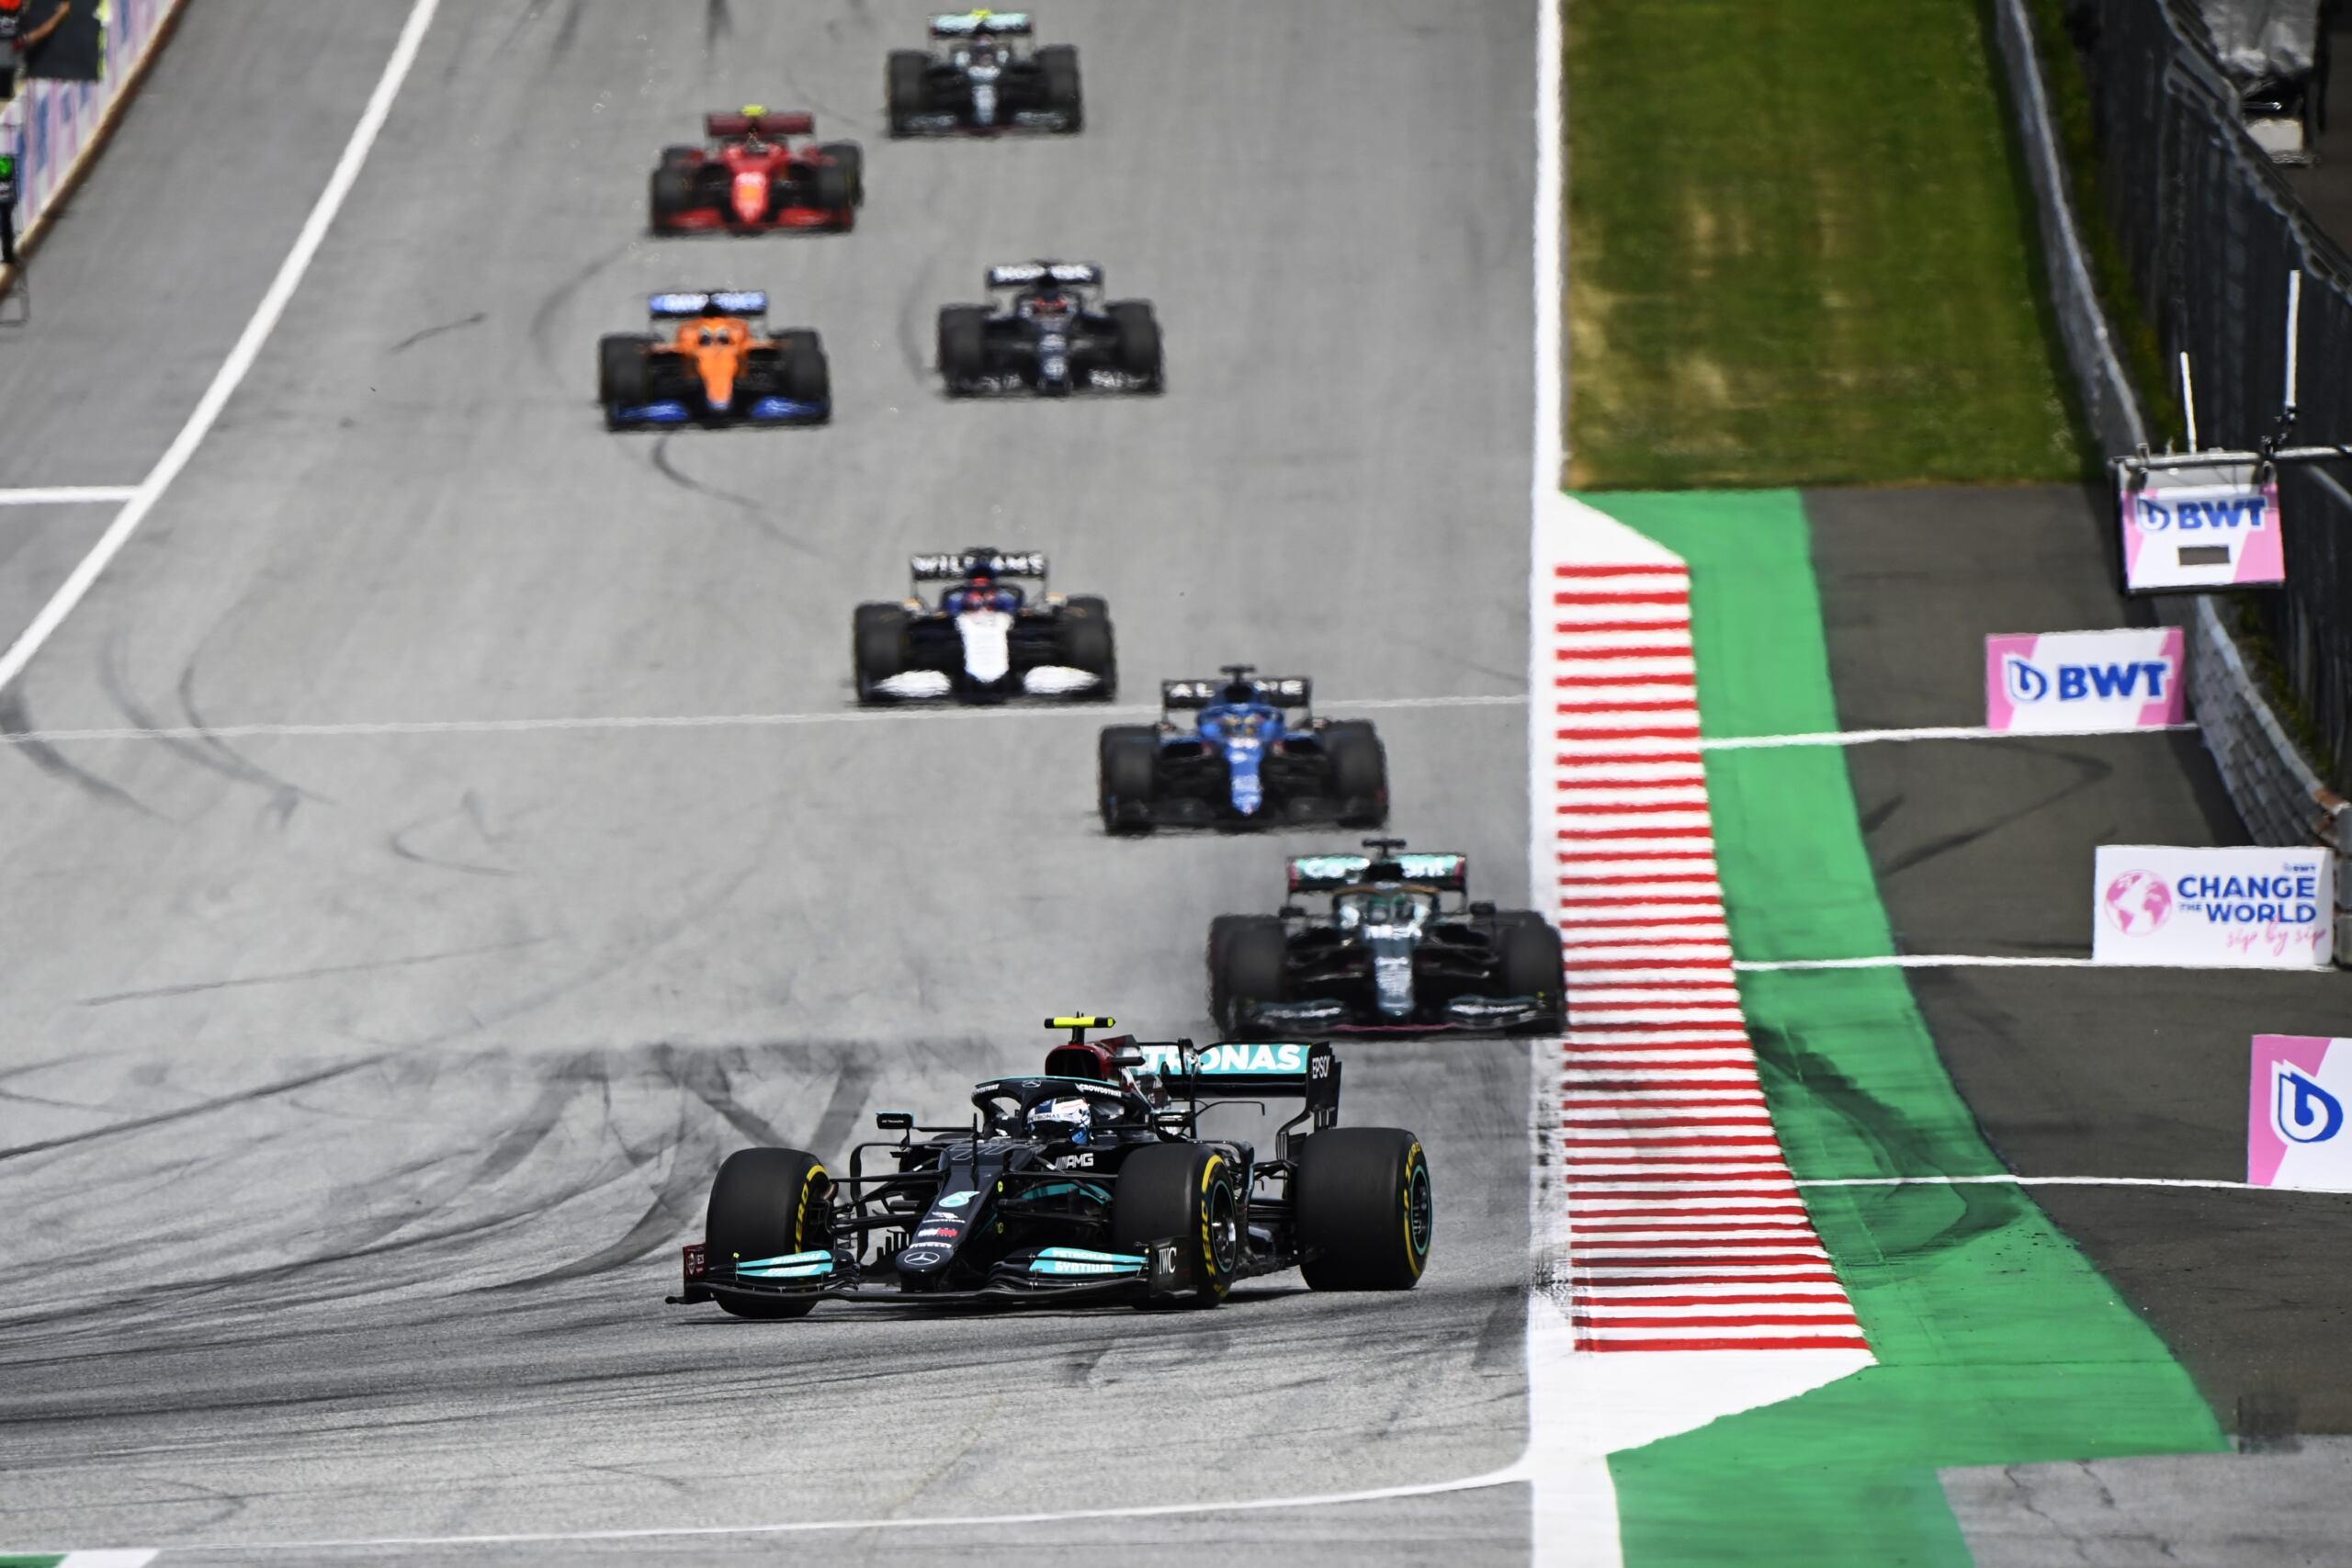 Mercedes-AMG Petronas F1 GP della Stiria 2021